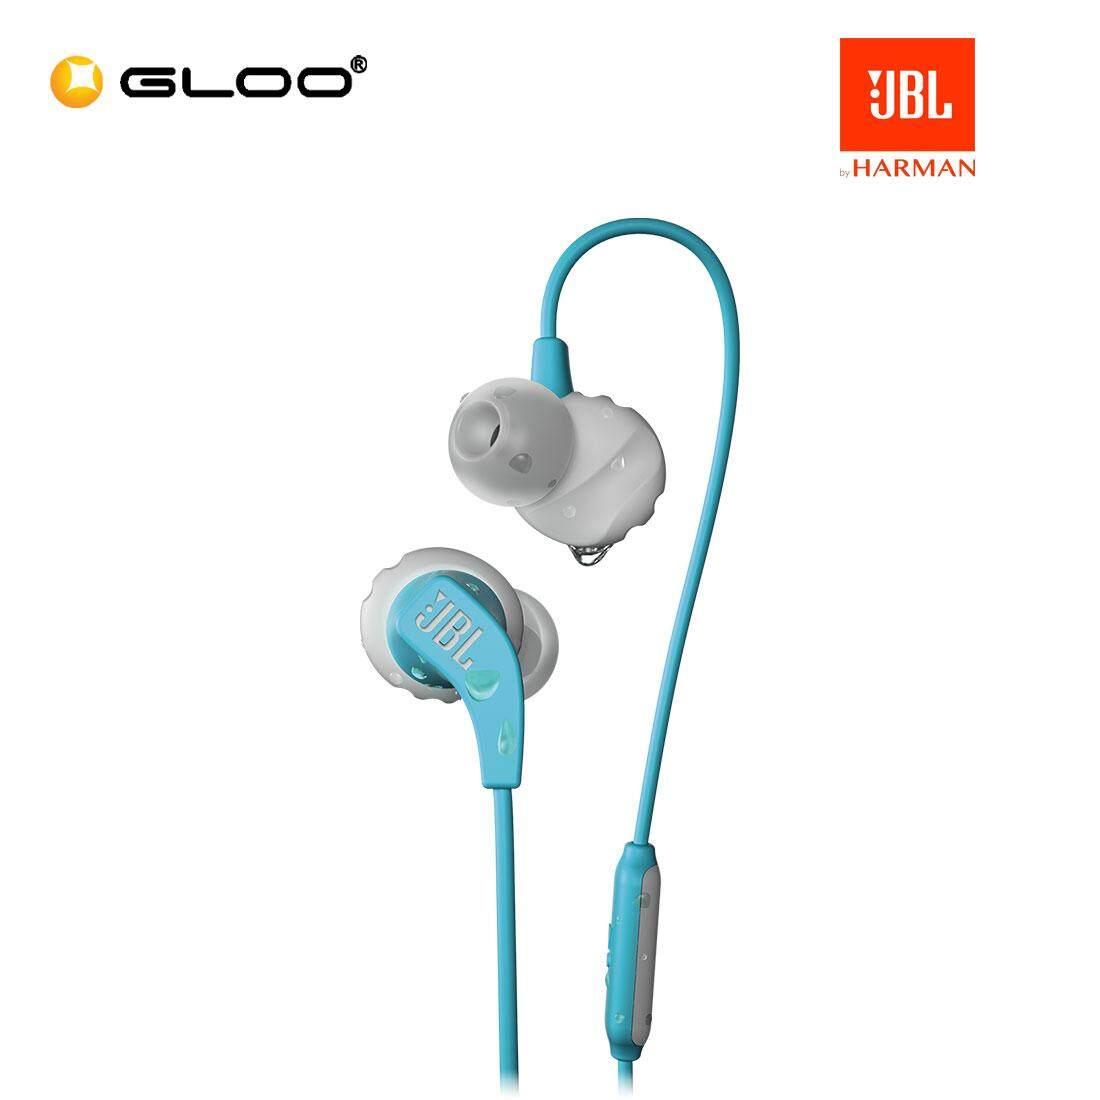 JBL Endurance Run Headphone (Blue/Red/Teal)